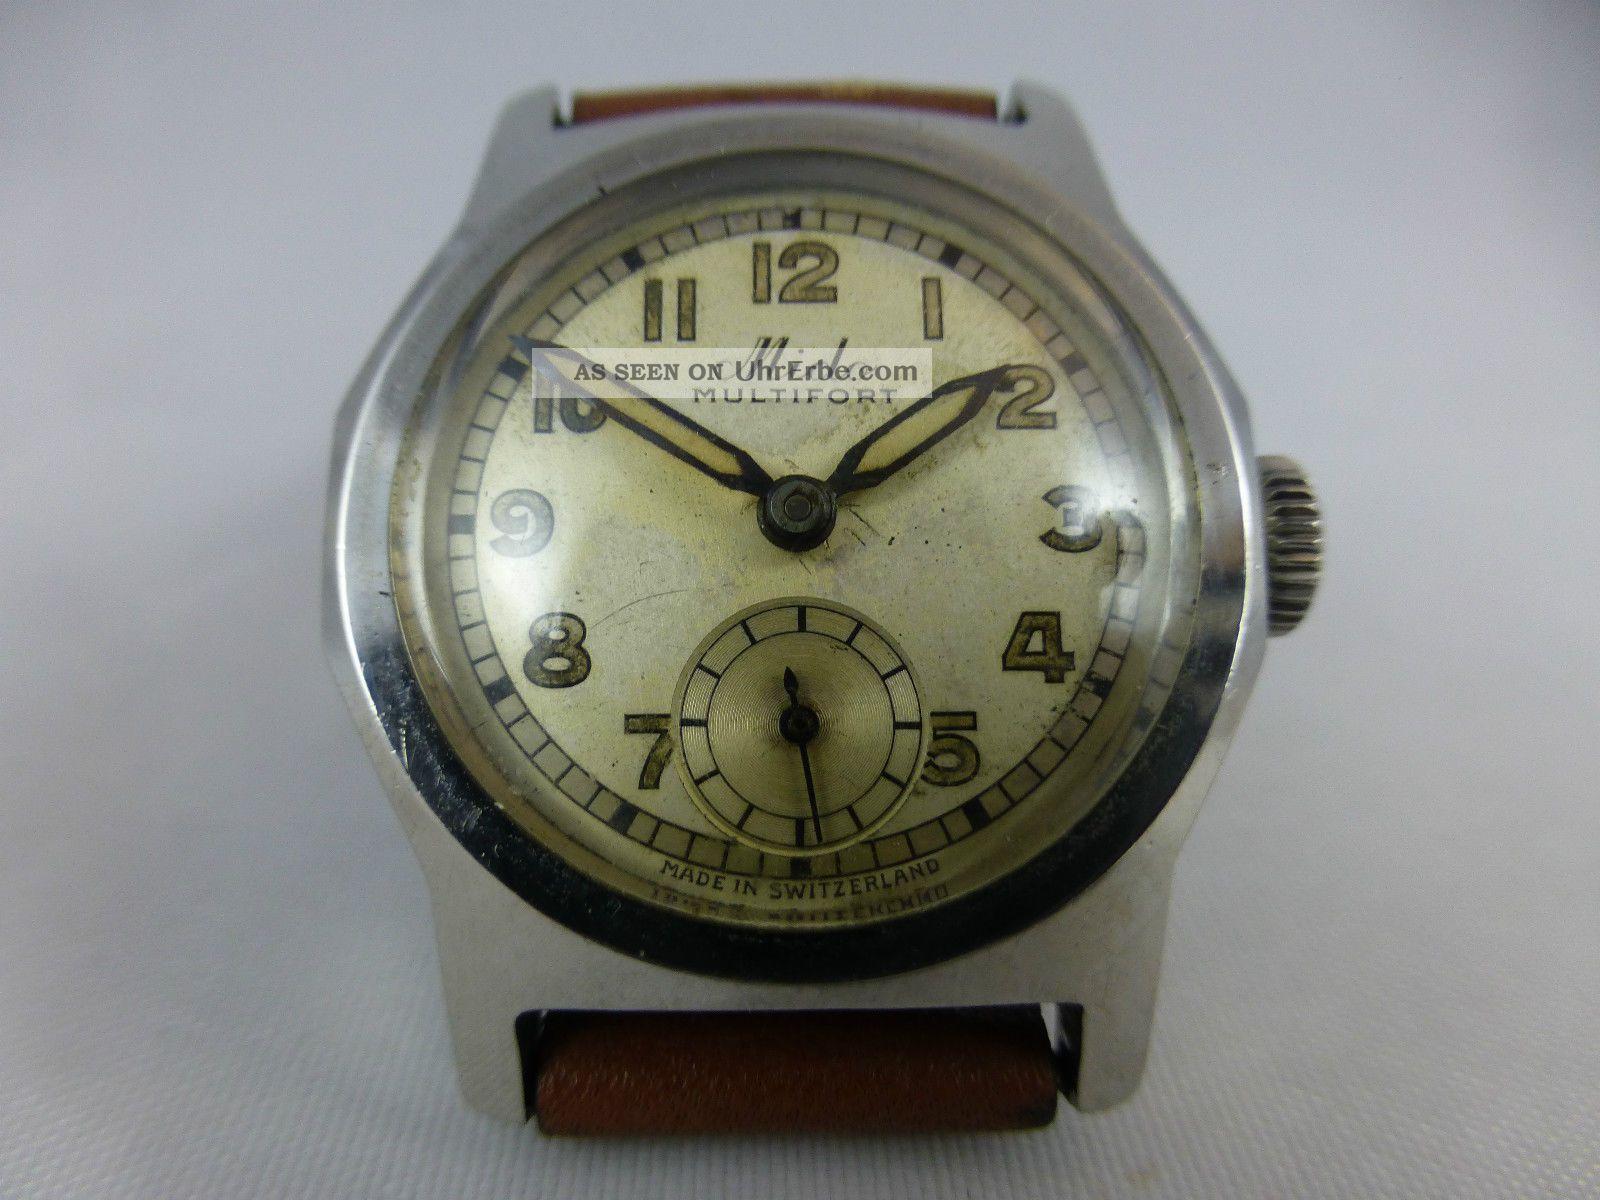 Mido Multifort Kal.  ? Handaufzug,  Edelstahl,  Vintage 1920 - 70 Armbanduhren Bild